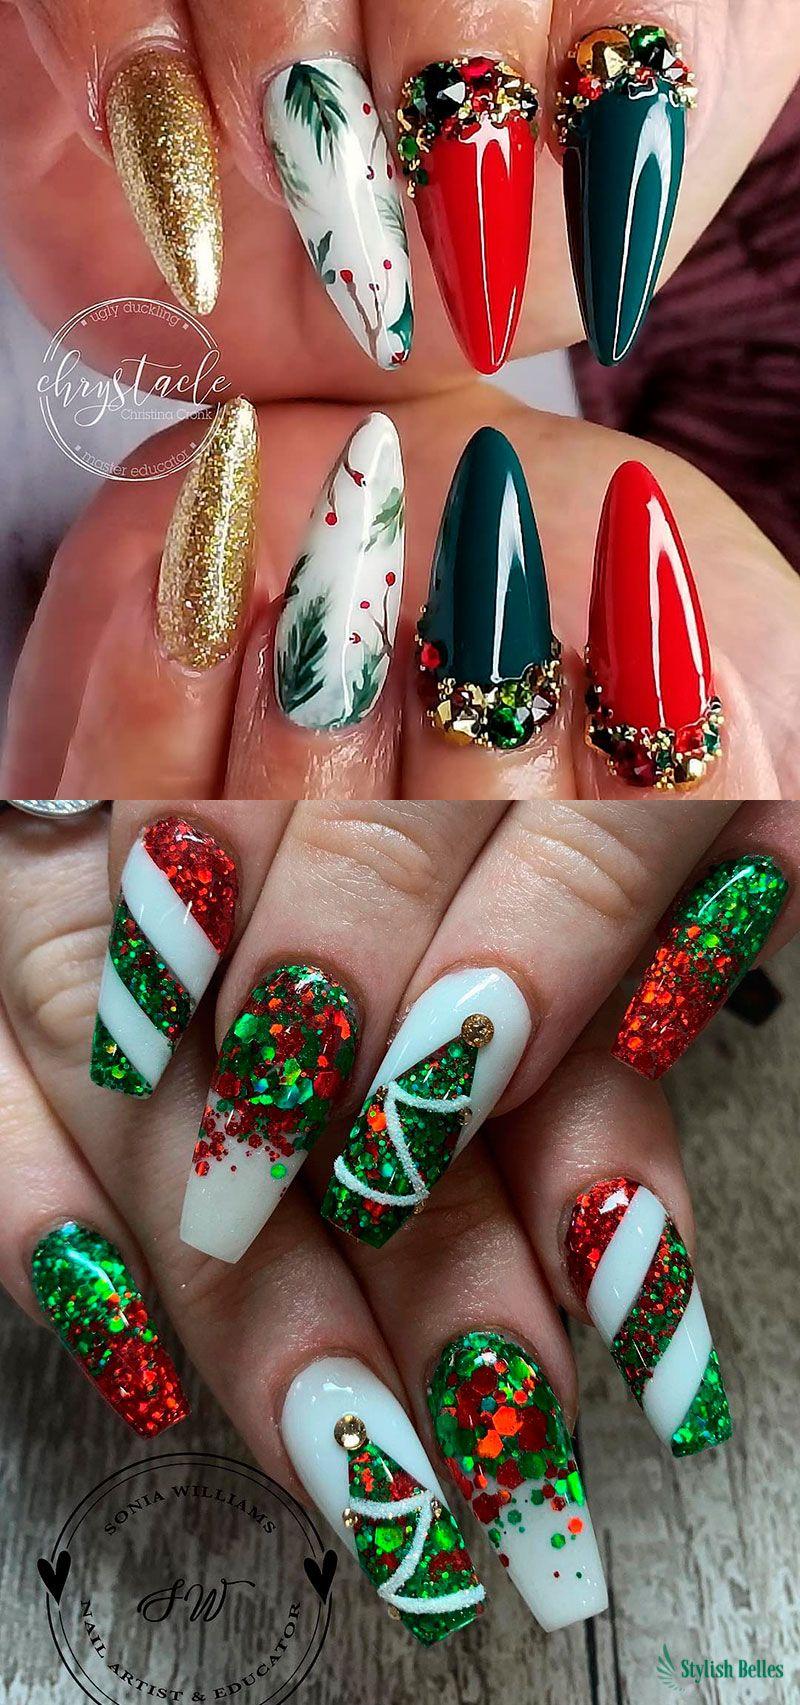 Cute Christmas Nails ideas for Celebration! #christmasnails #christmasnailart #christmasnaildesign #Christmas2018 #nailideas